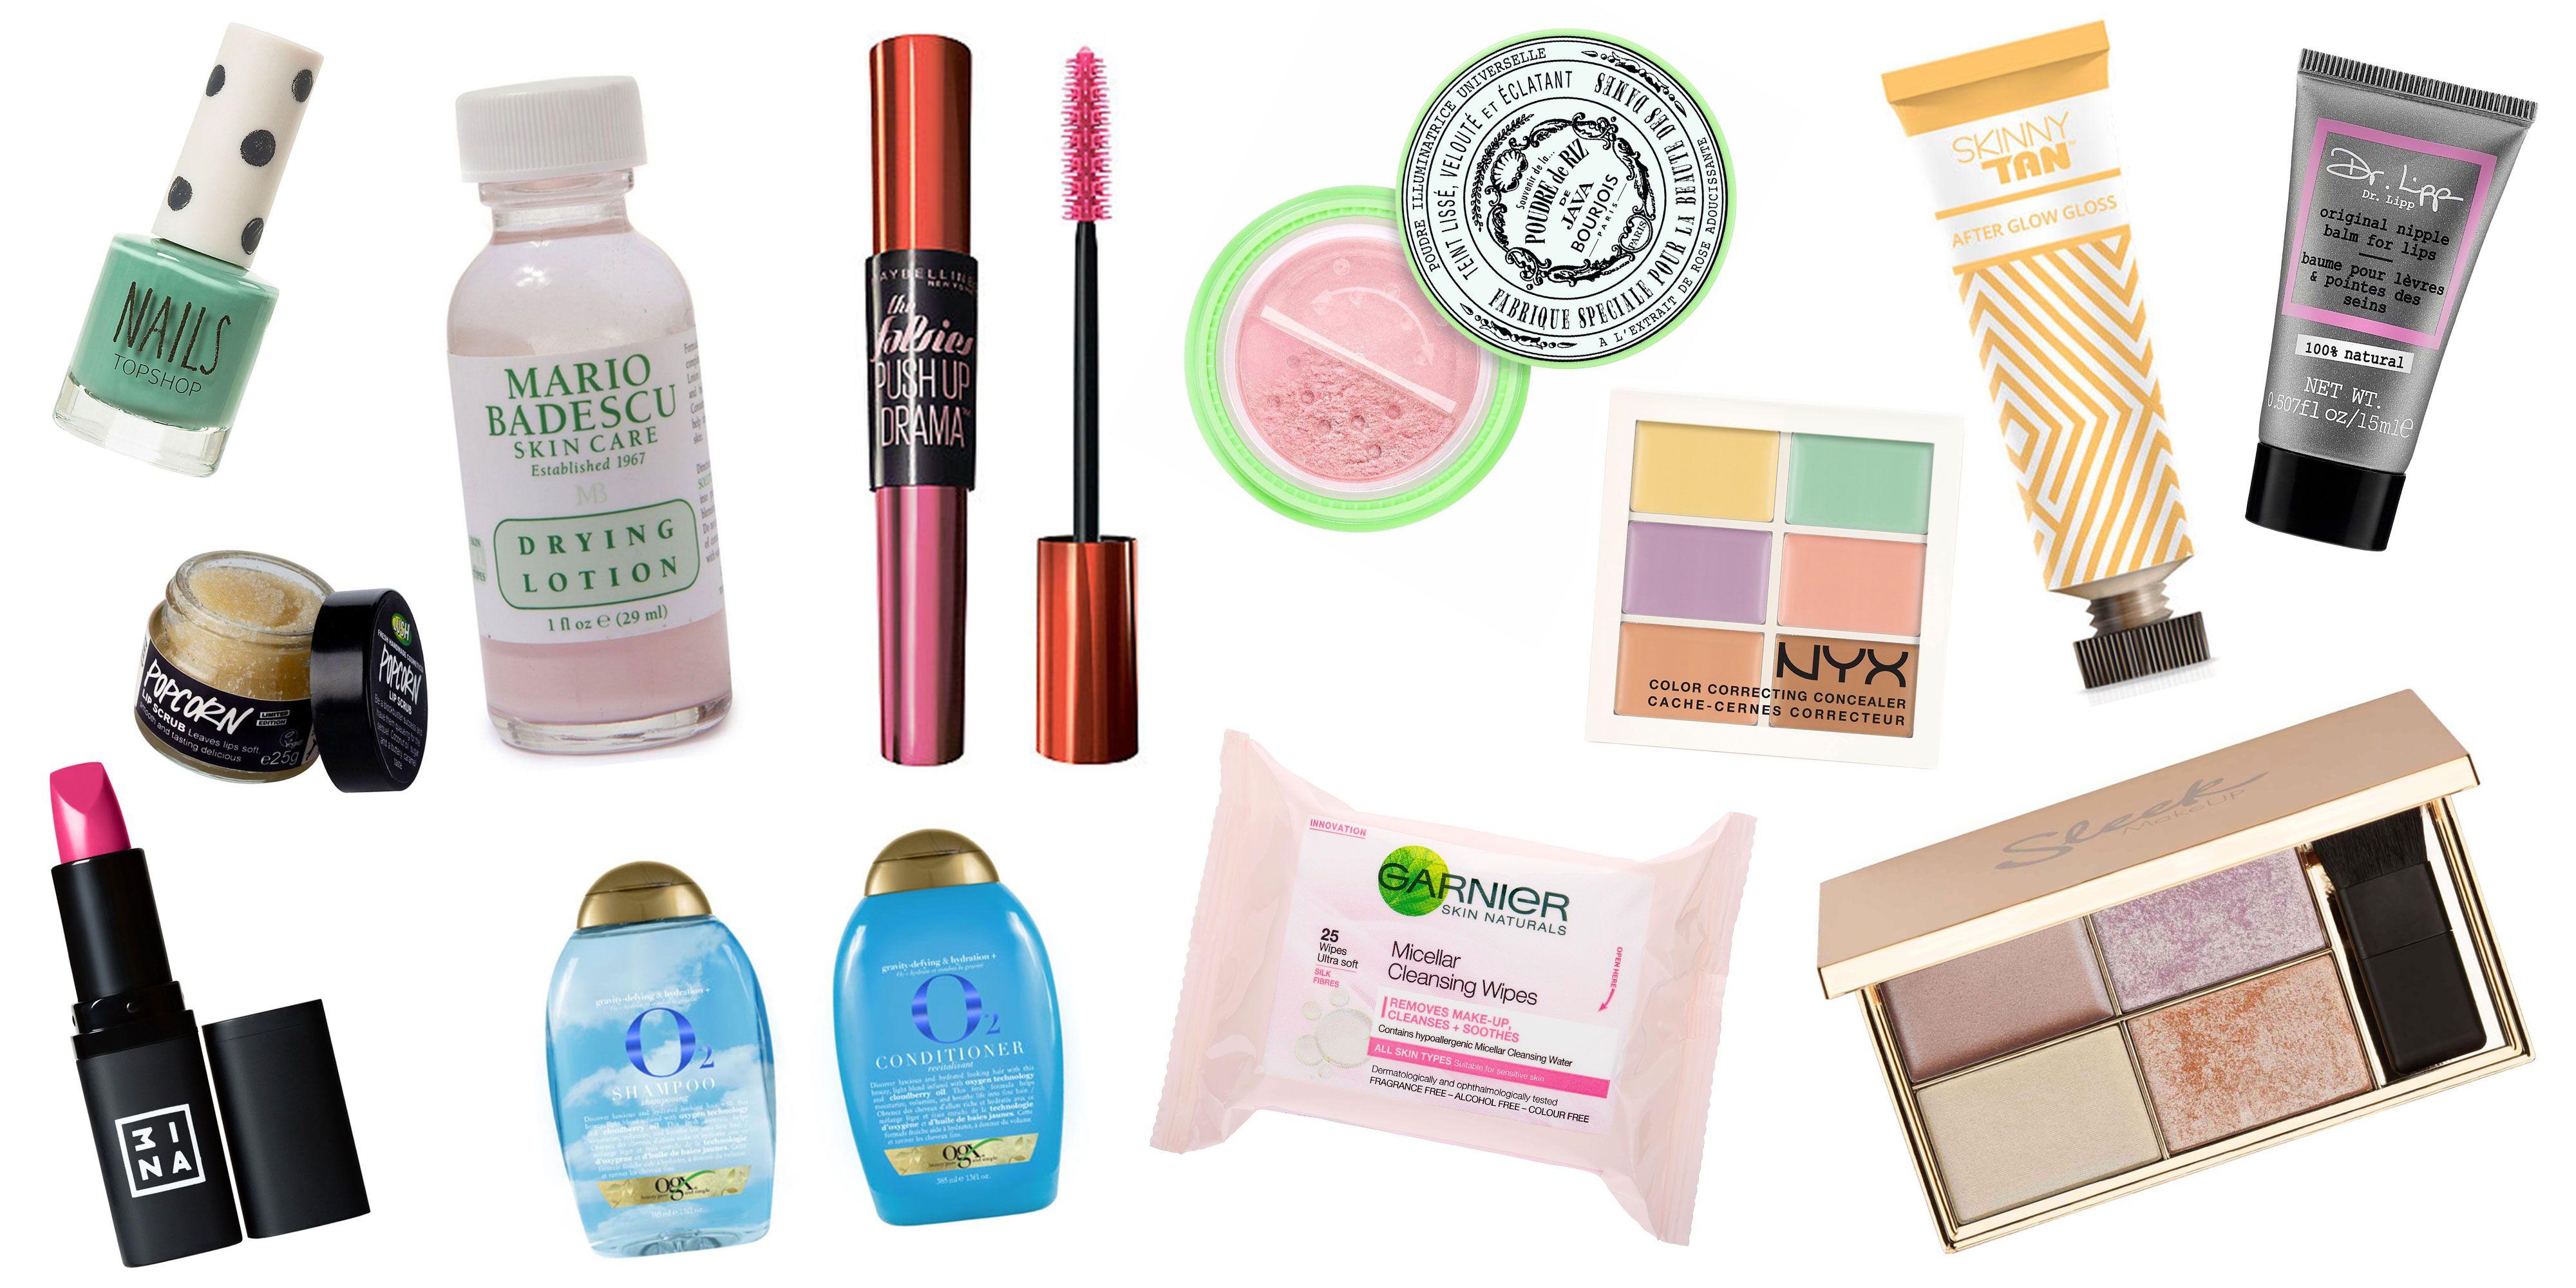 De 6 best verkopende beauty buys op Net-a-Porter